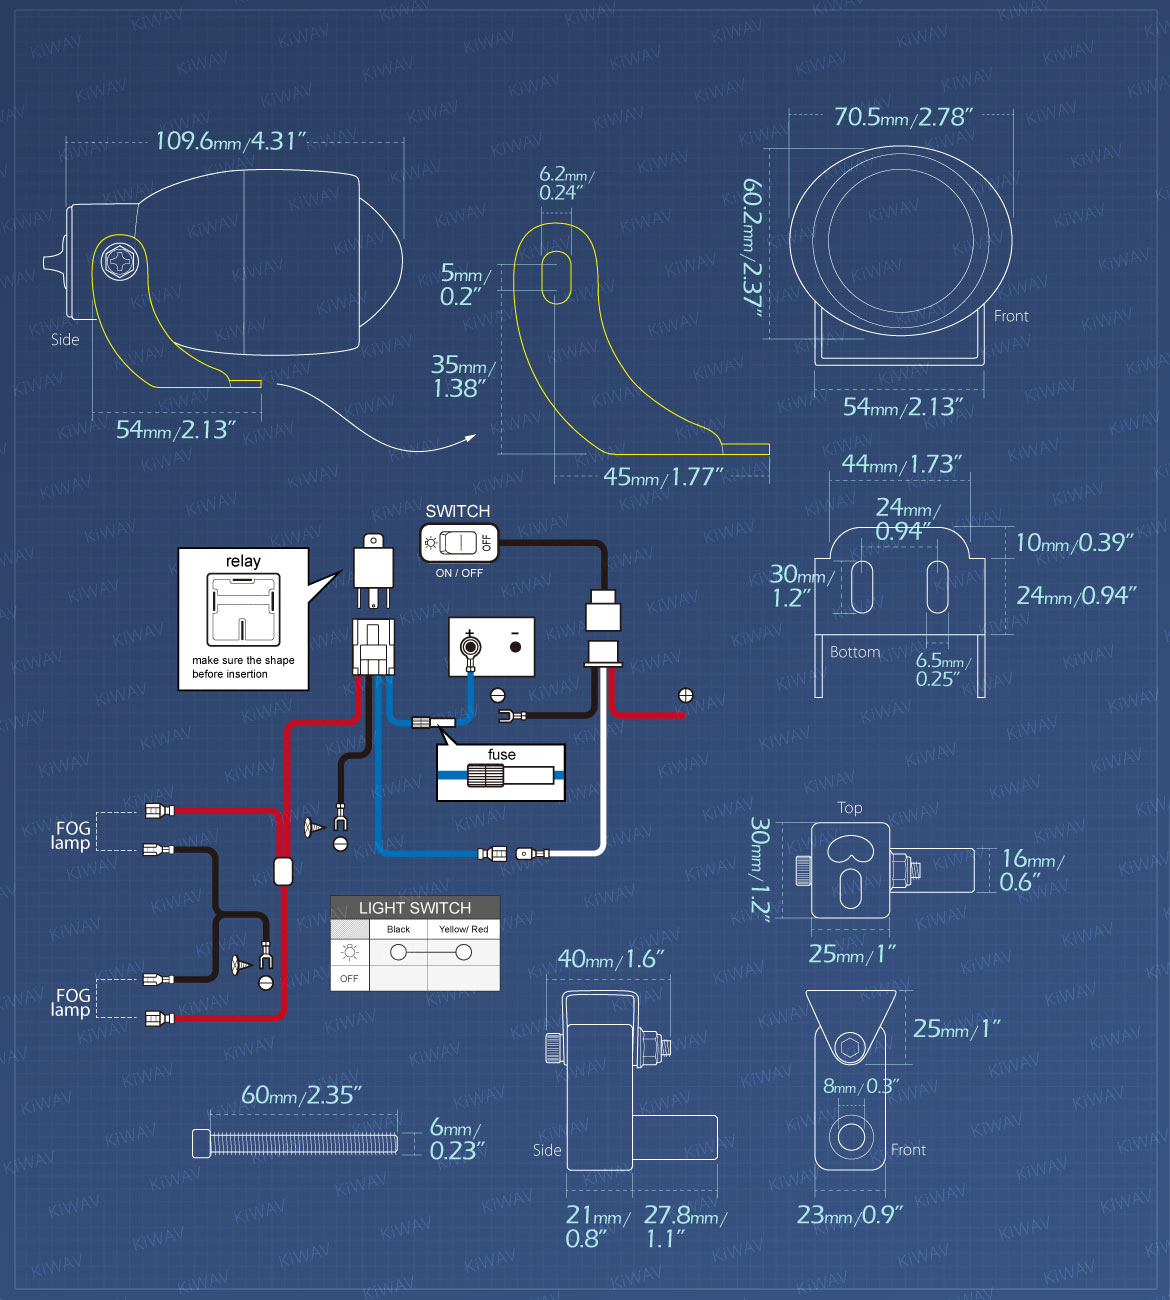 Measurement of KiWAV motorcycle 1.9 inches 12V 55W round fisheye fog lights with wiring kits